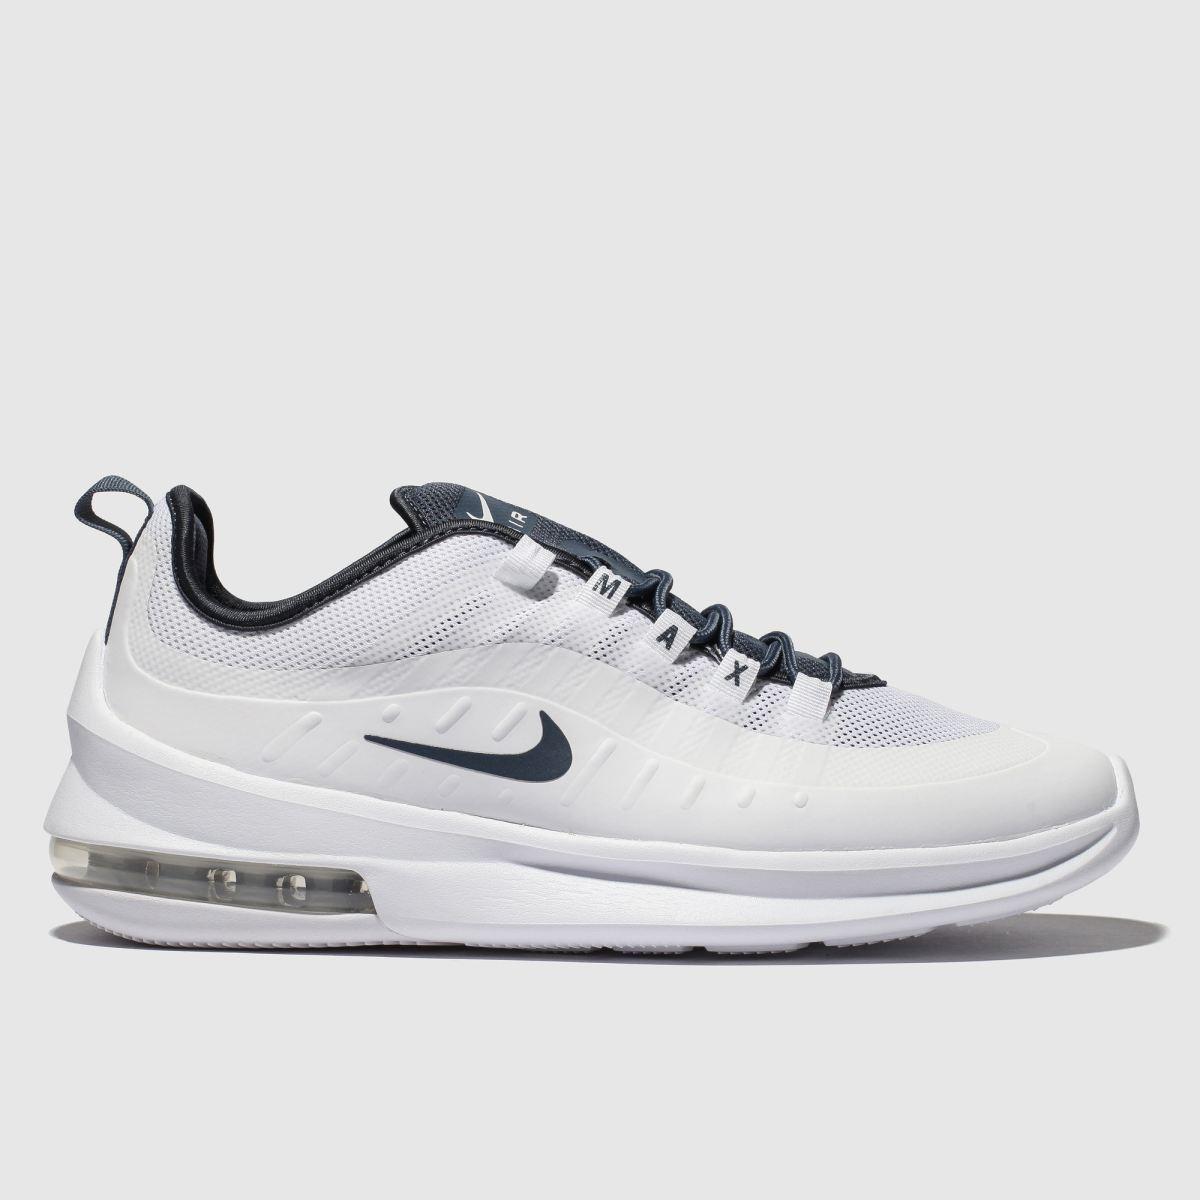 Nike White & Blue Air Max Axis Trainers